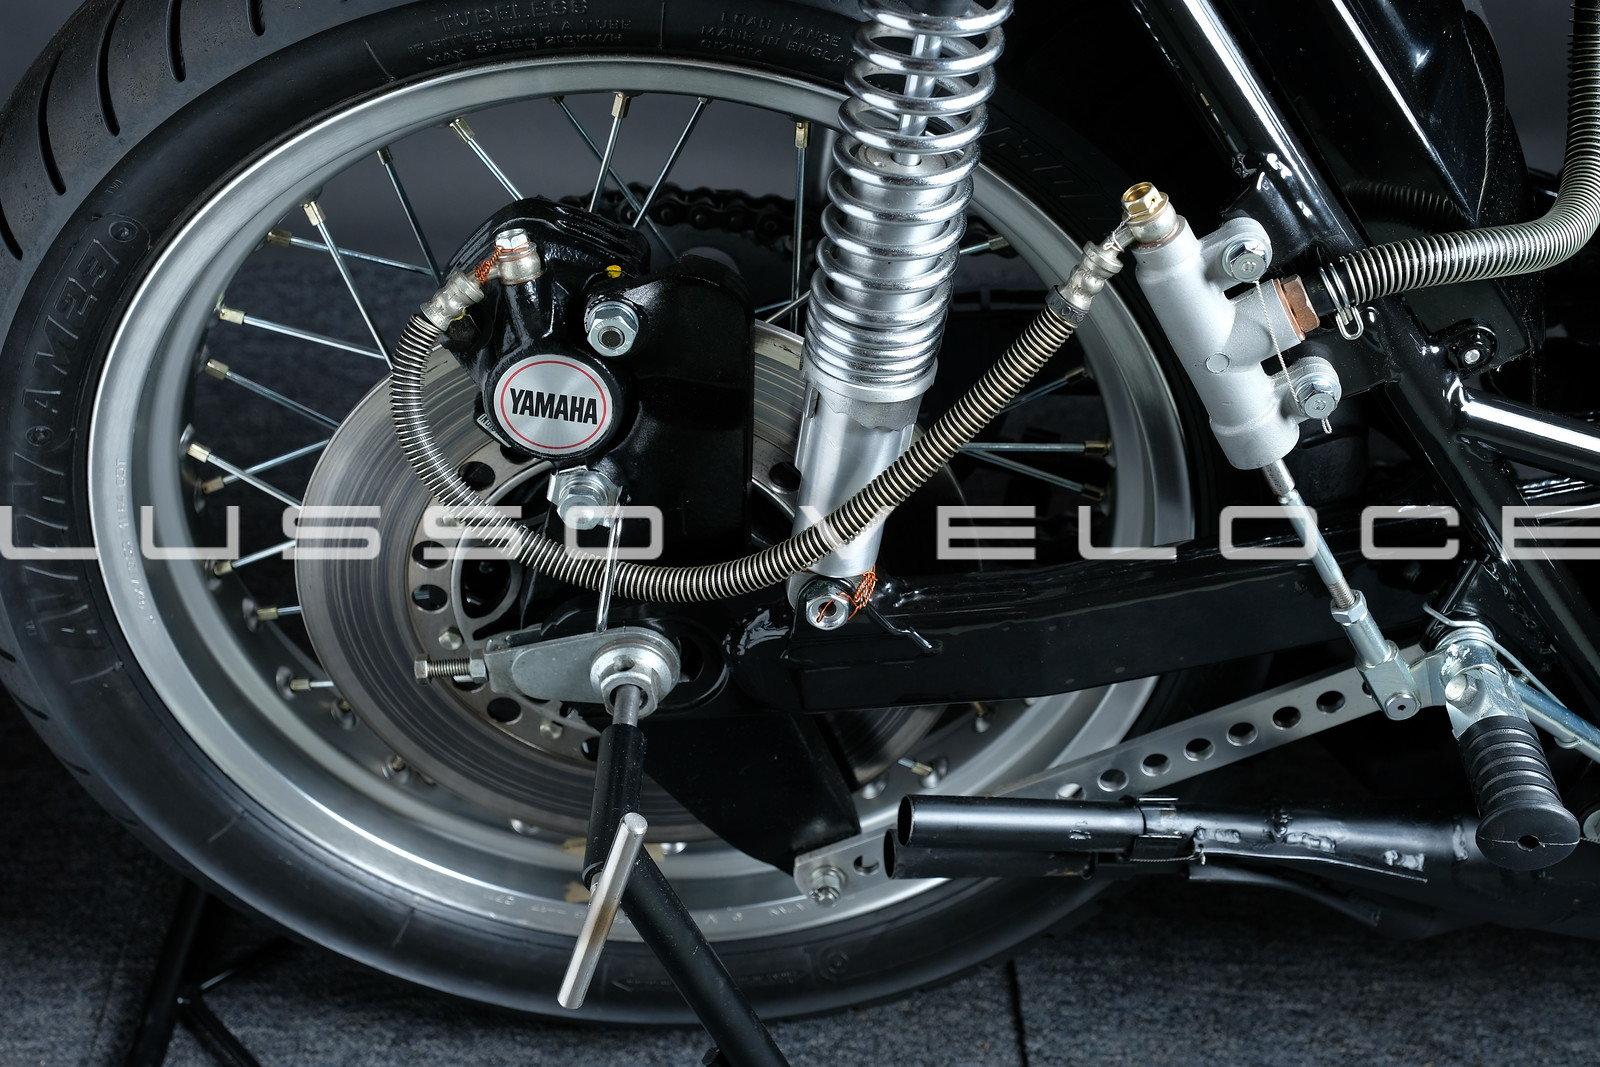 1975 Yamaha TZ 750 C GP Race bike For Sale (picture 5 of 6)